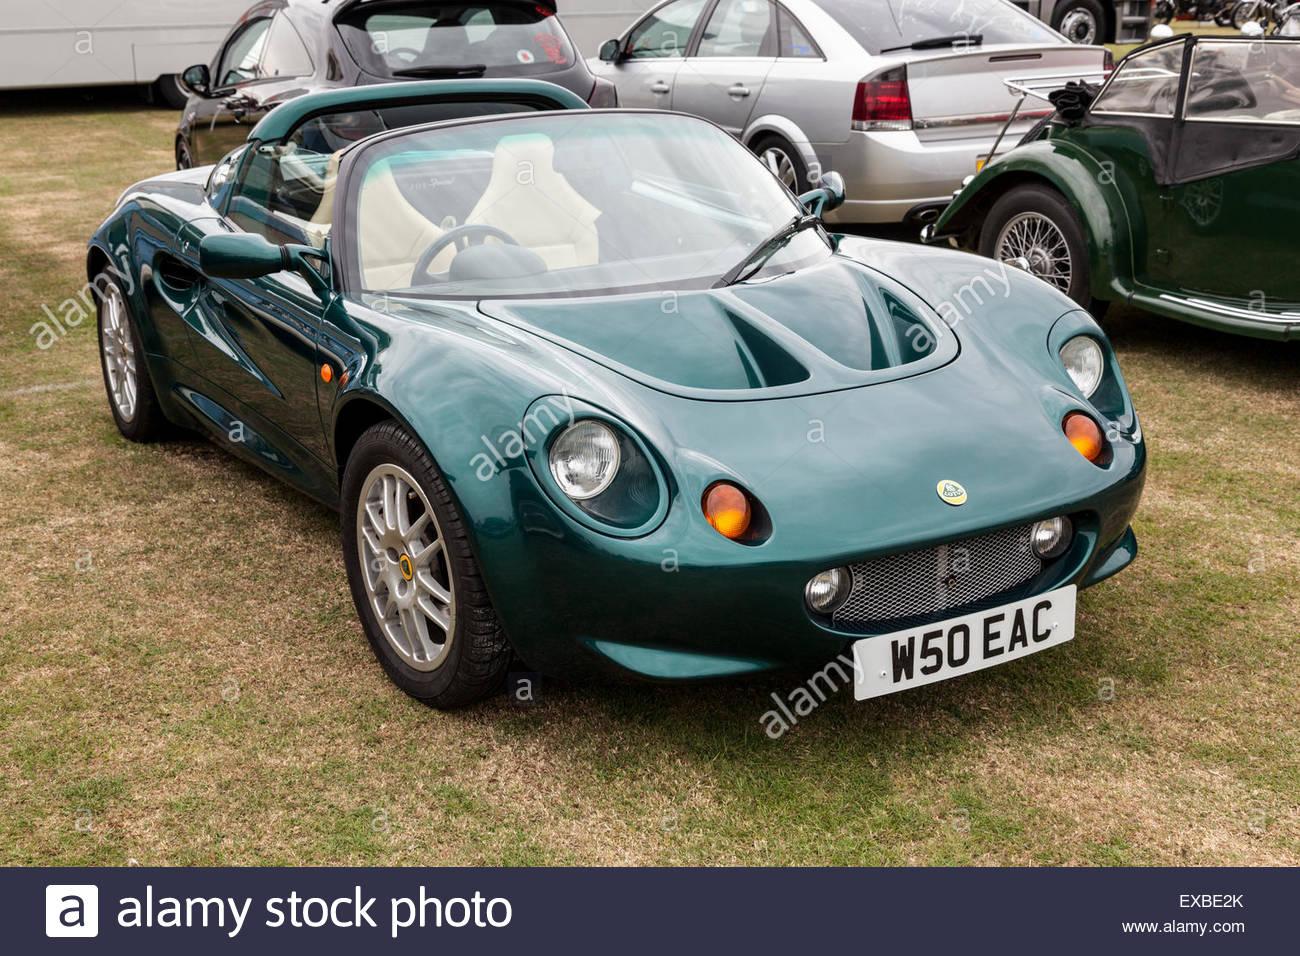 Lotus Elise Sports Car - Stock Image